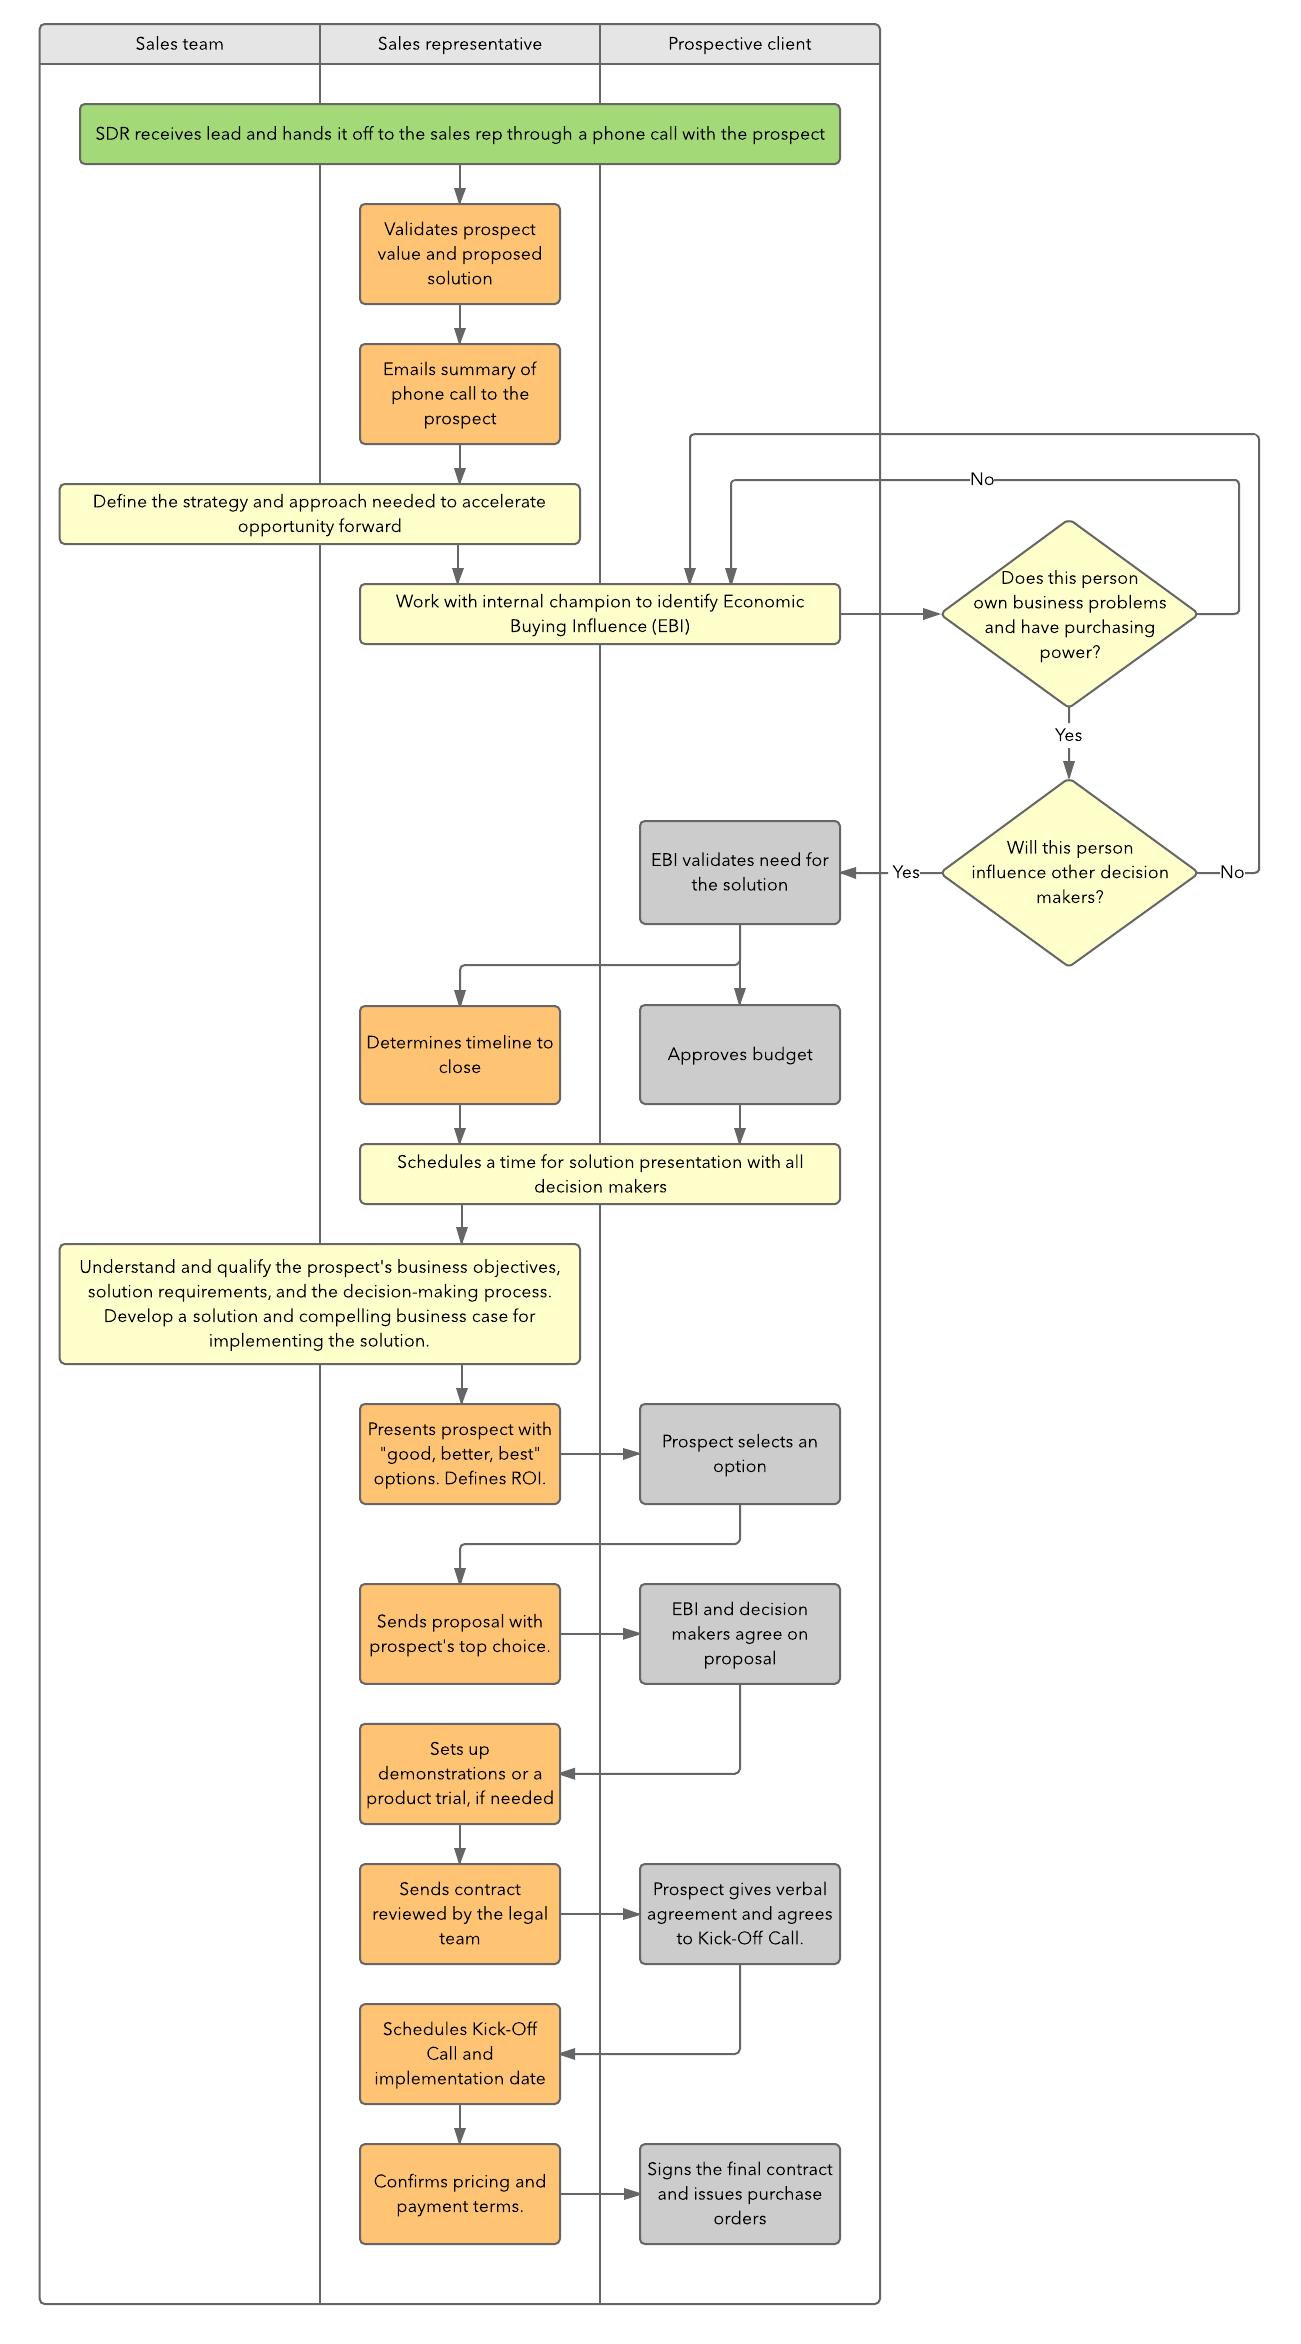 sales process cheat sheet - Process Of Sales